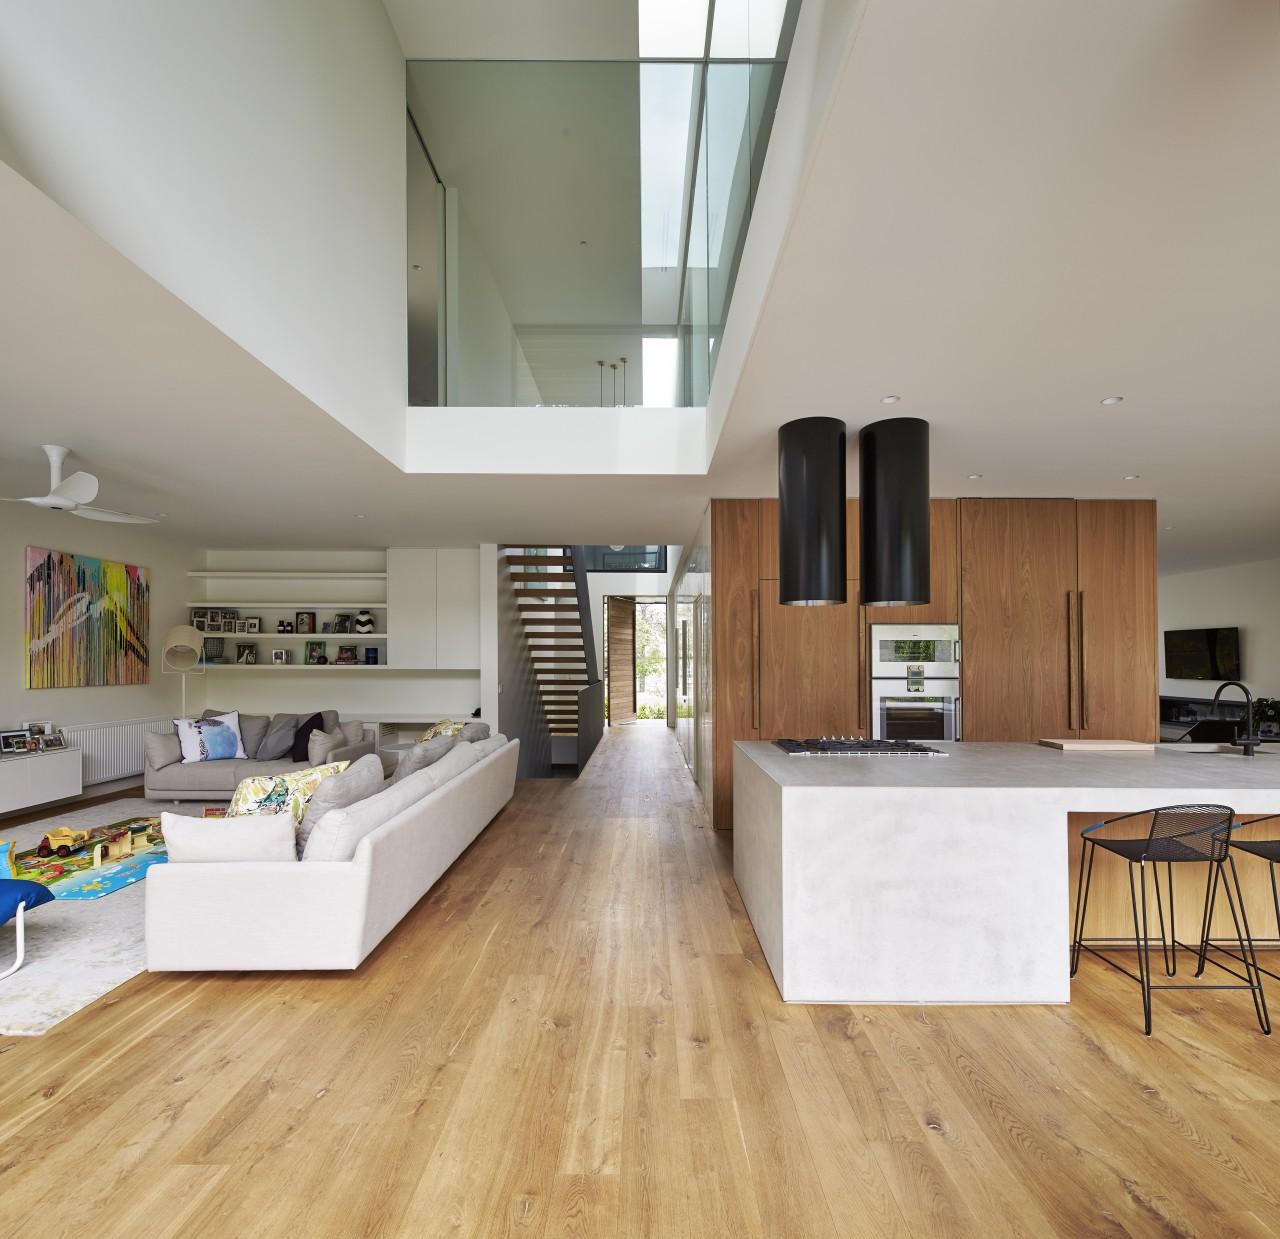 The family living area is on the left floor, flooring, hardwood, interior design, kitchen, laminate flooring, living room, wood, wood flooring, gray